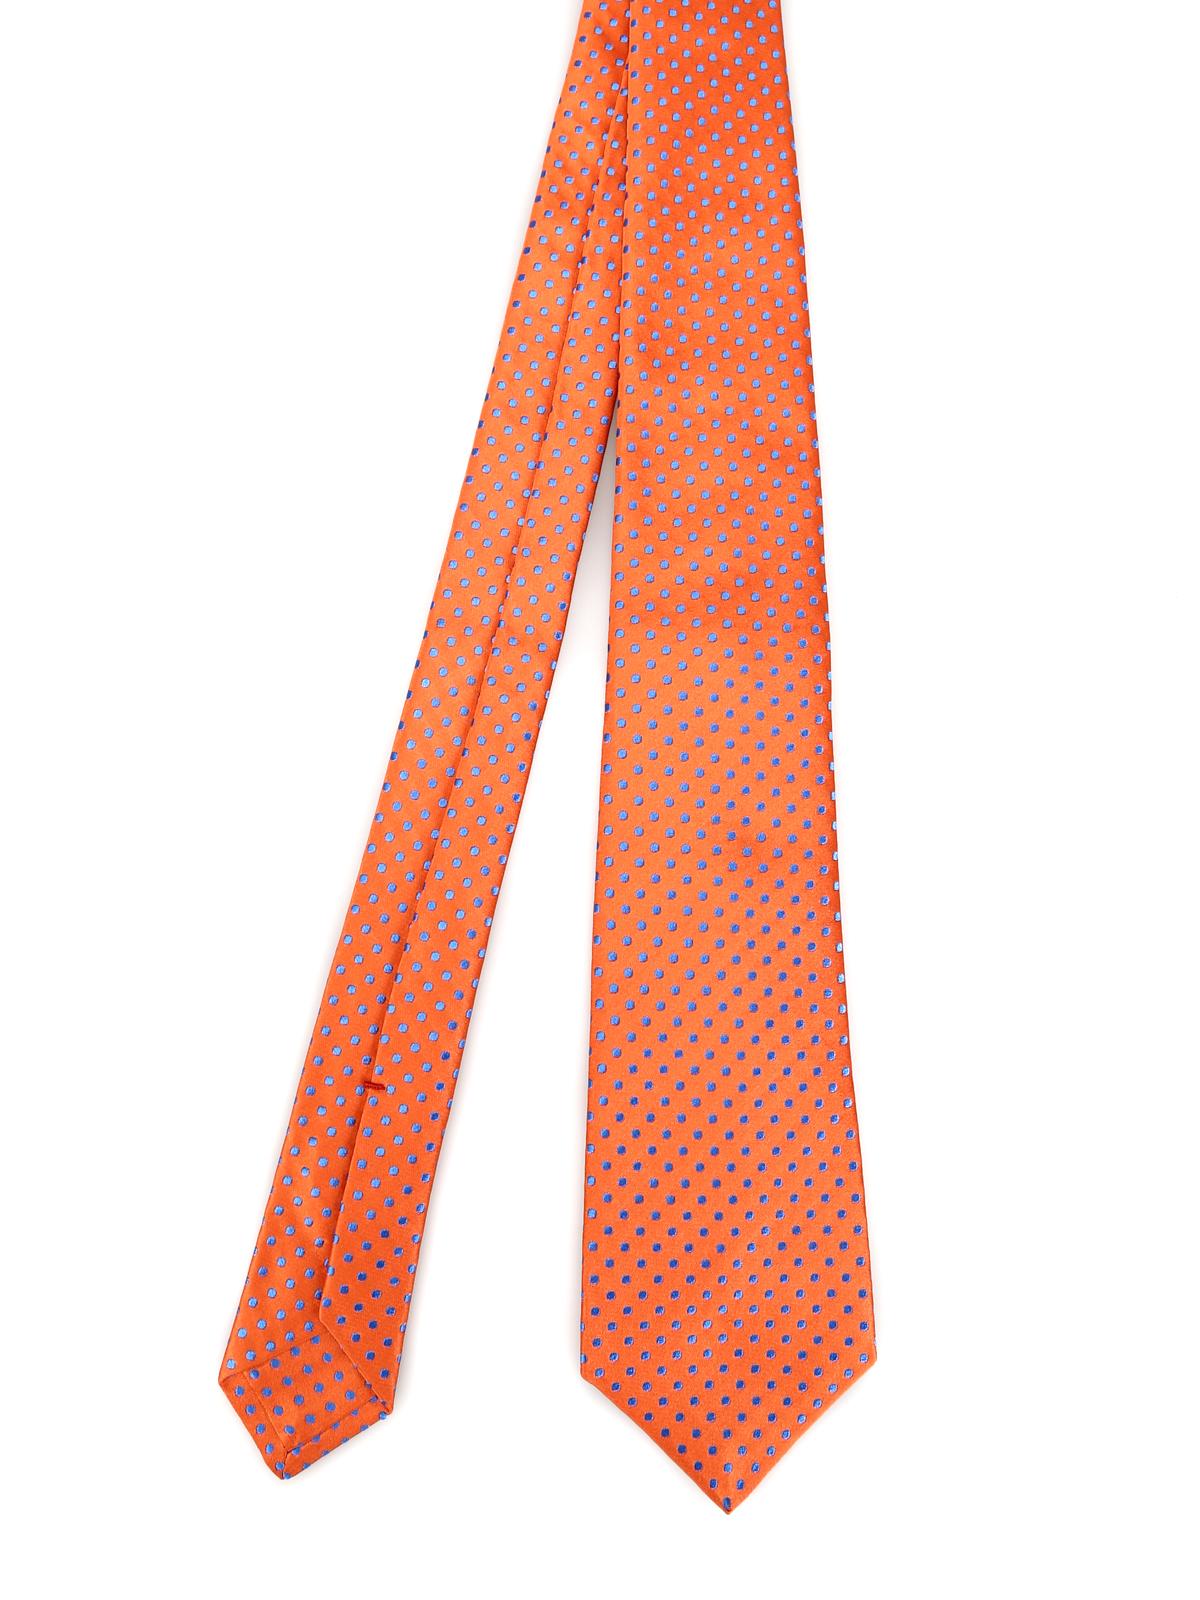 super popular 38a0d 0eaf6 Kiton - Cravatta in seta arancio a pois blu - cravatte e ...